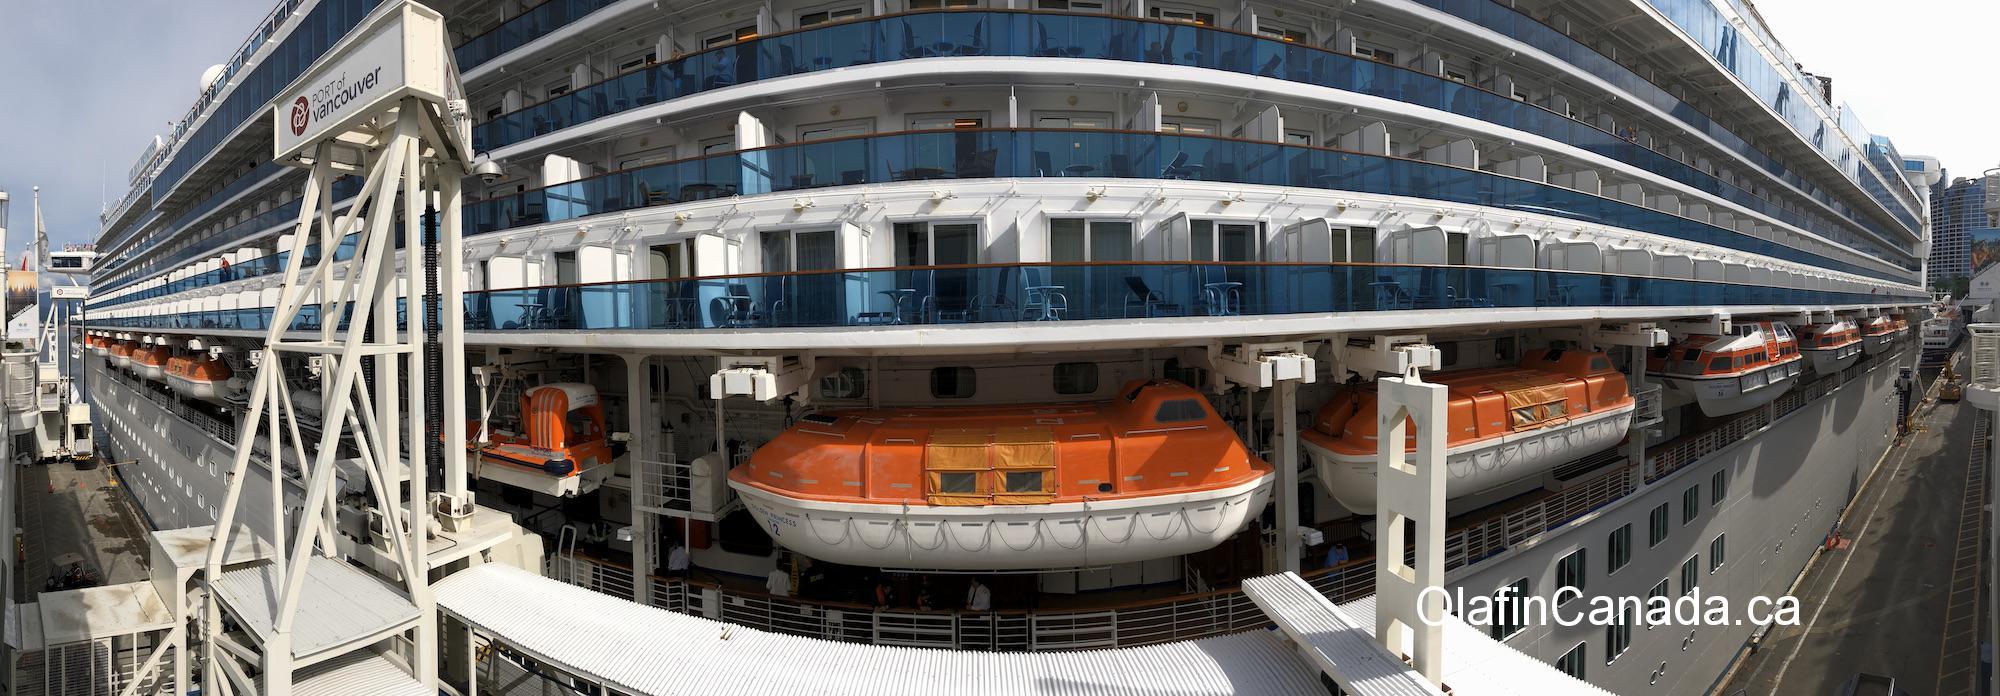 Fish eye photo of cruise ship in Vancouver #olafincanada #britishcolumbia #discoverbc #vancouver #cruiseship